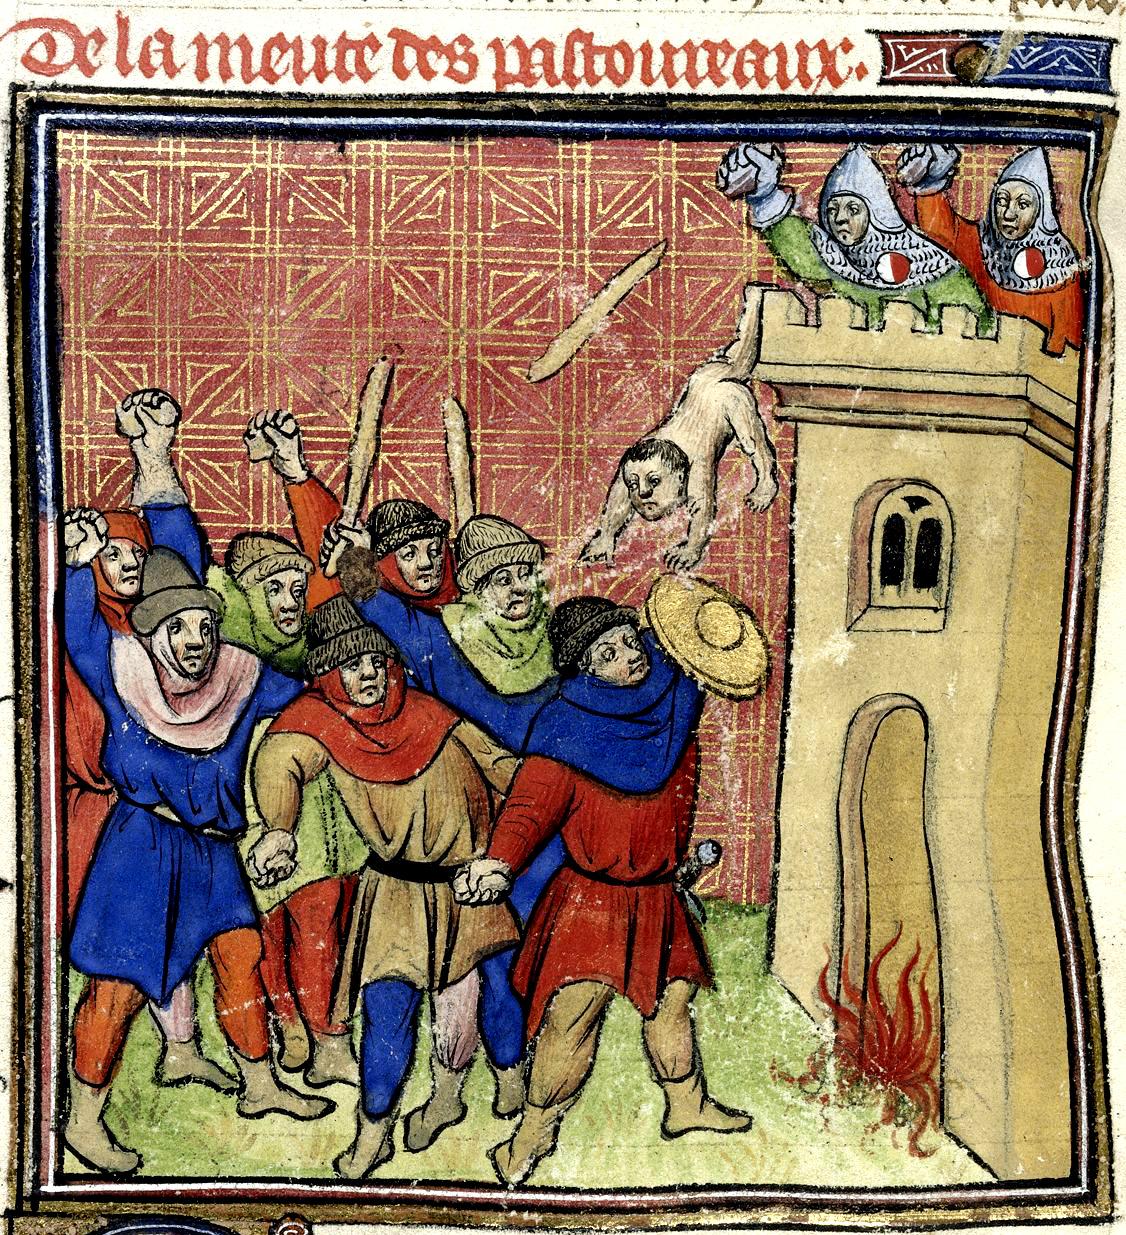 https://upload.wikimedia.org/wikipedia/commons/b/b0/Croisade_des_Pastoreaux_Britisch_Librairy.jpg